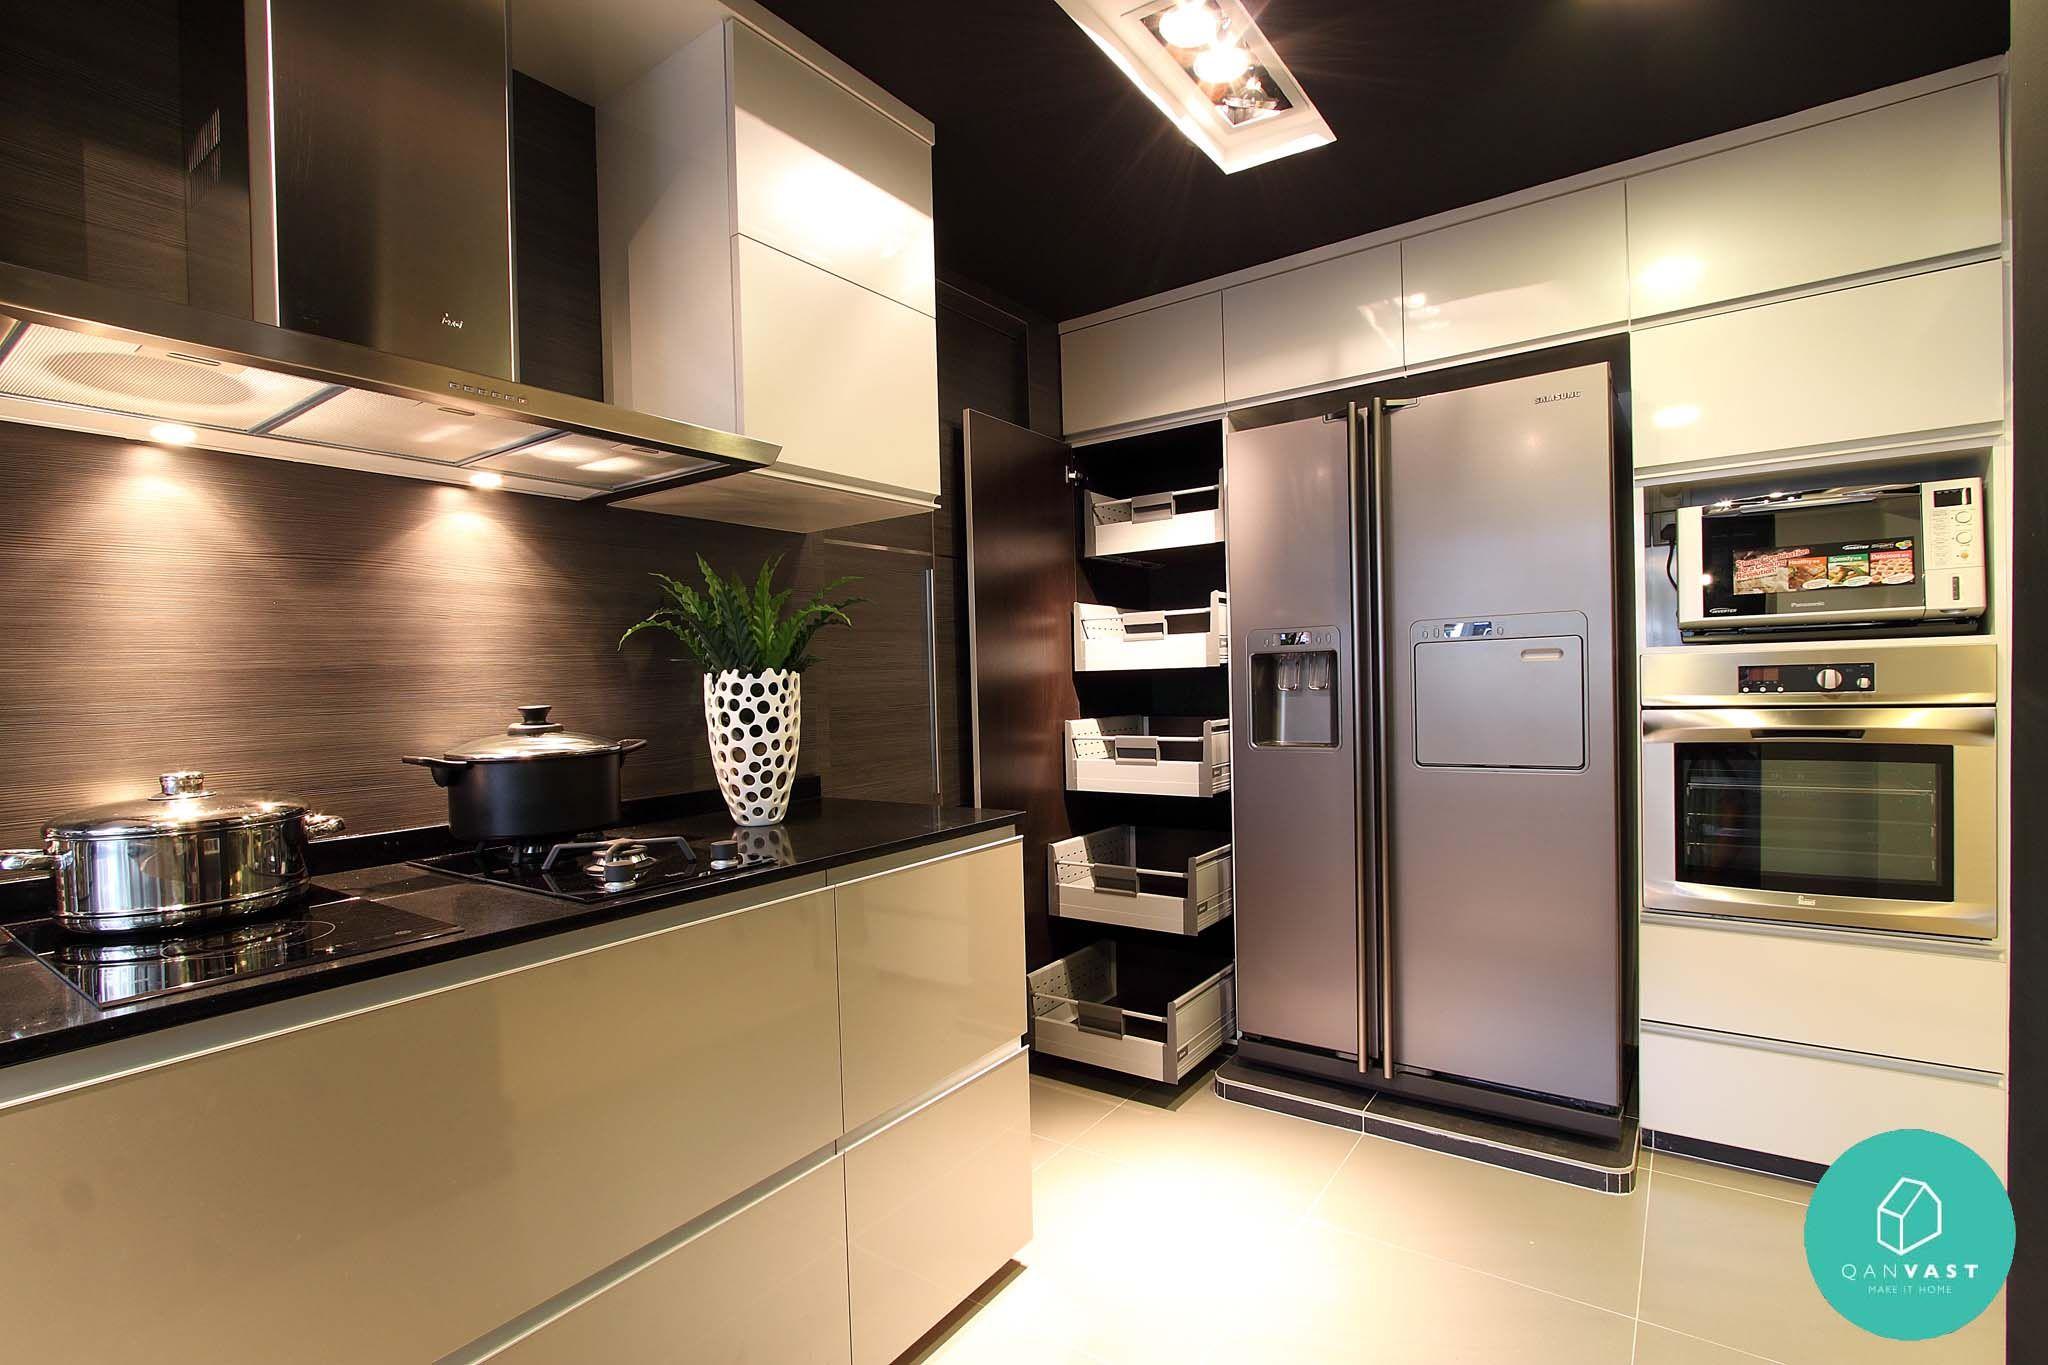 12 Kitchens That Gordon Ramsay Would Approve Of Kitchen Condo Kitchen Kitchen Decor